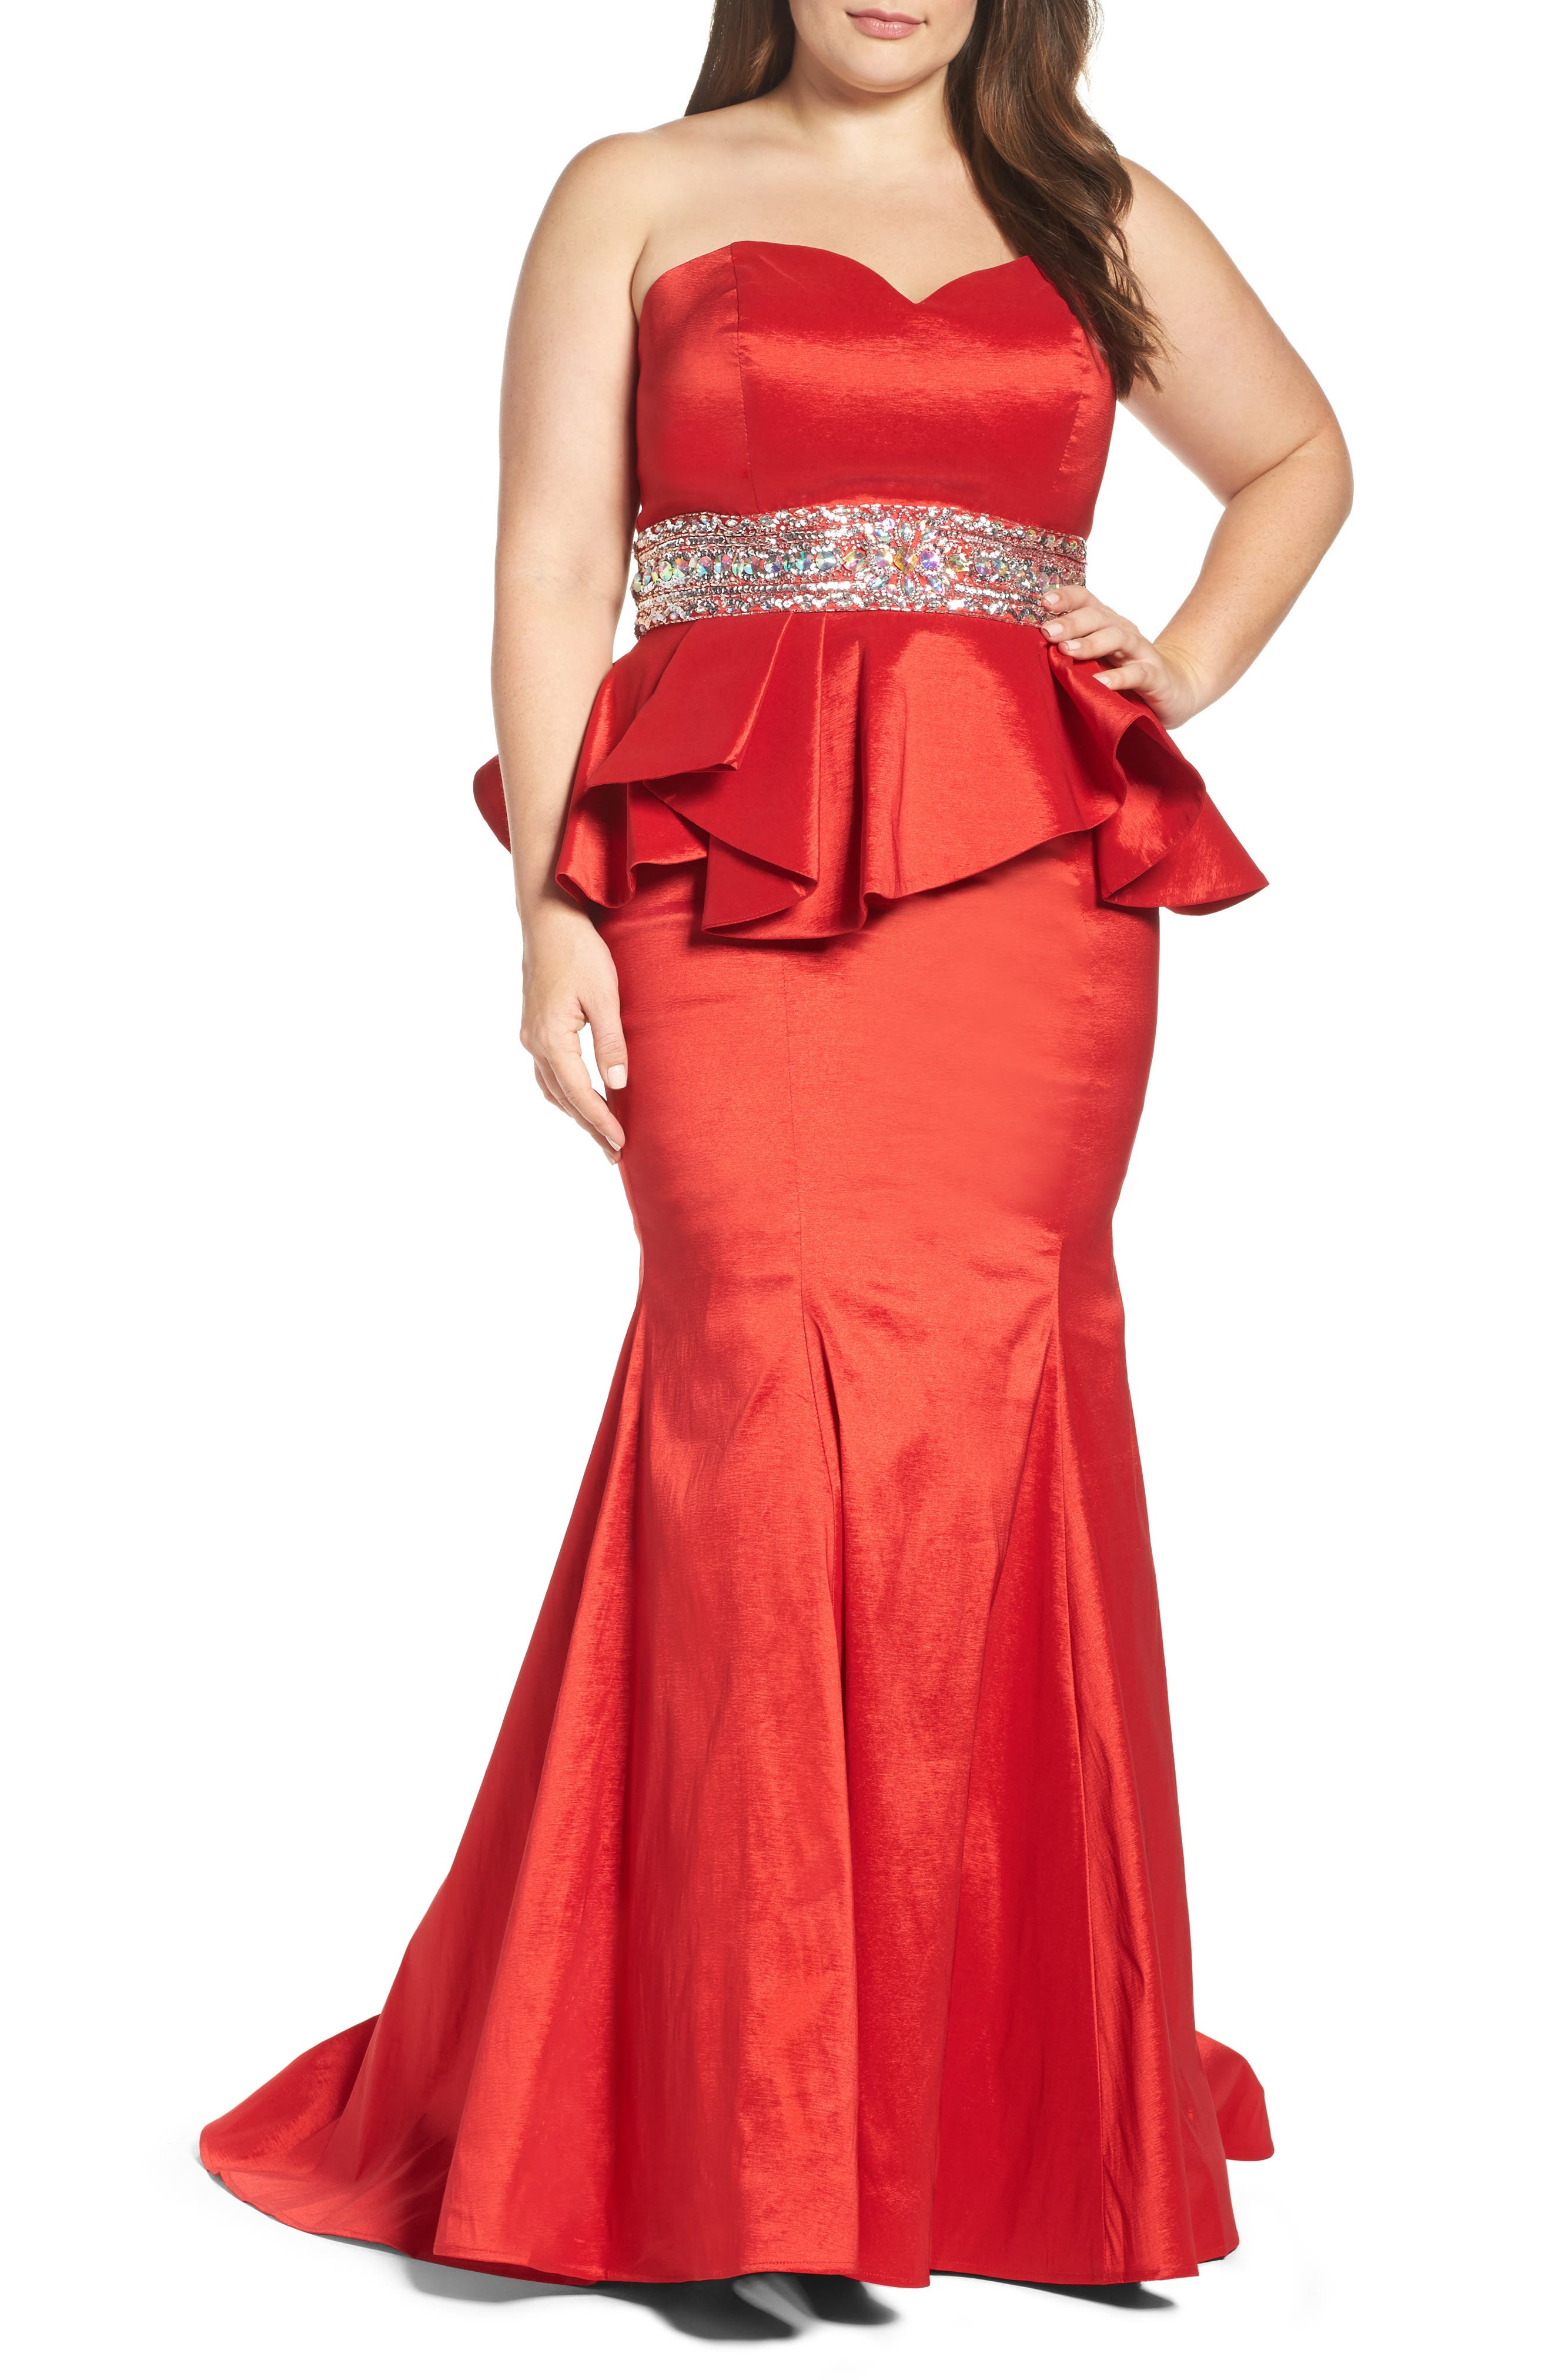 Main Image - Mac Duggal Beaded Bustier Peplum Gown (Plus Size)